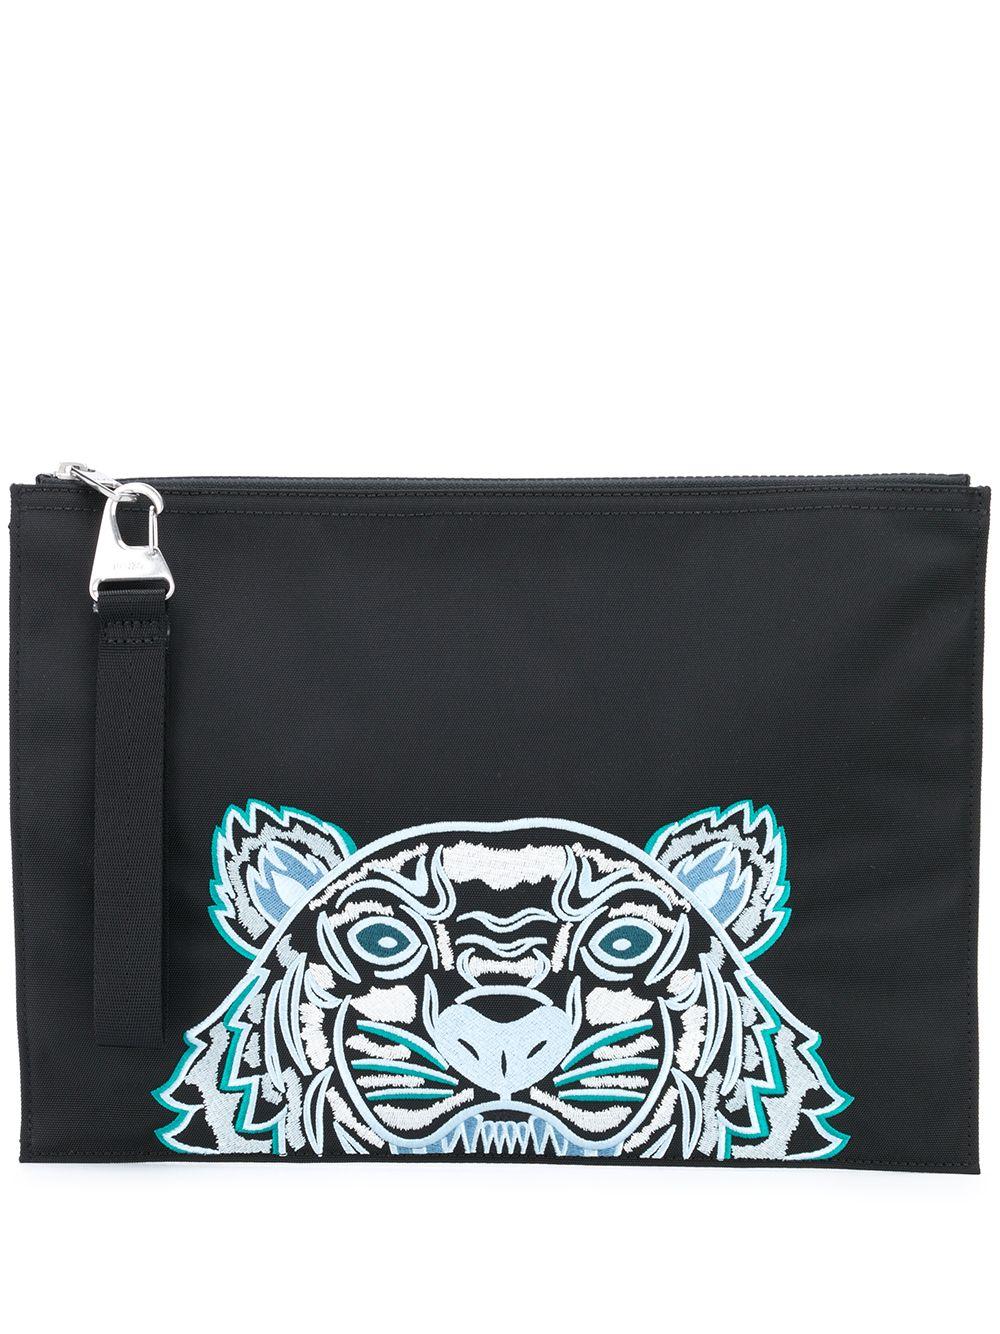 Logo Embroidered Clutch Bag